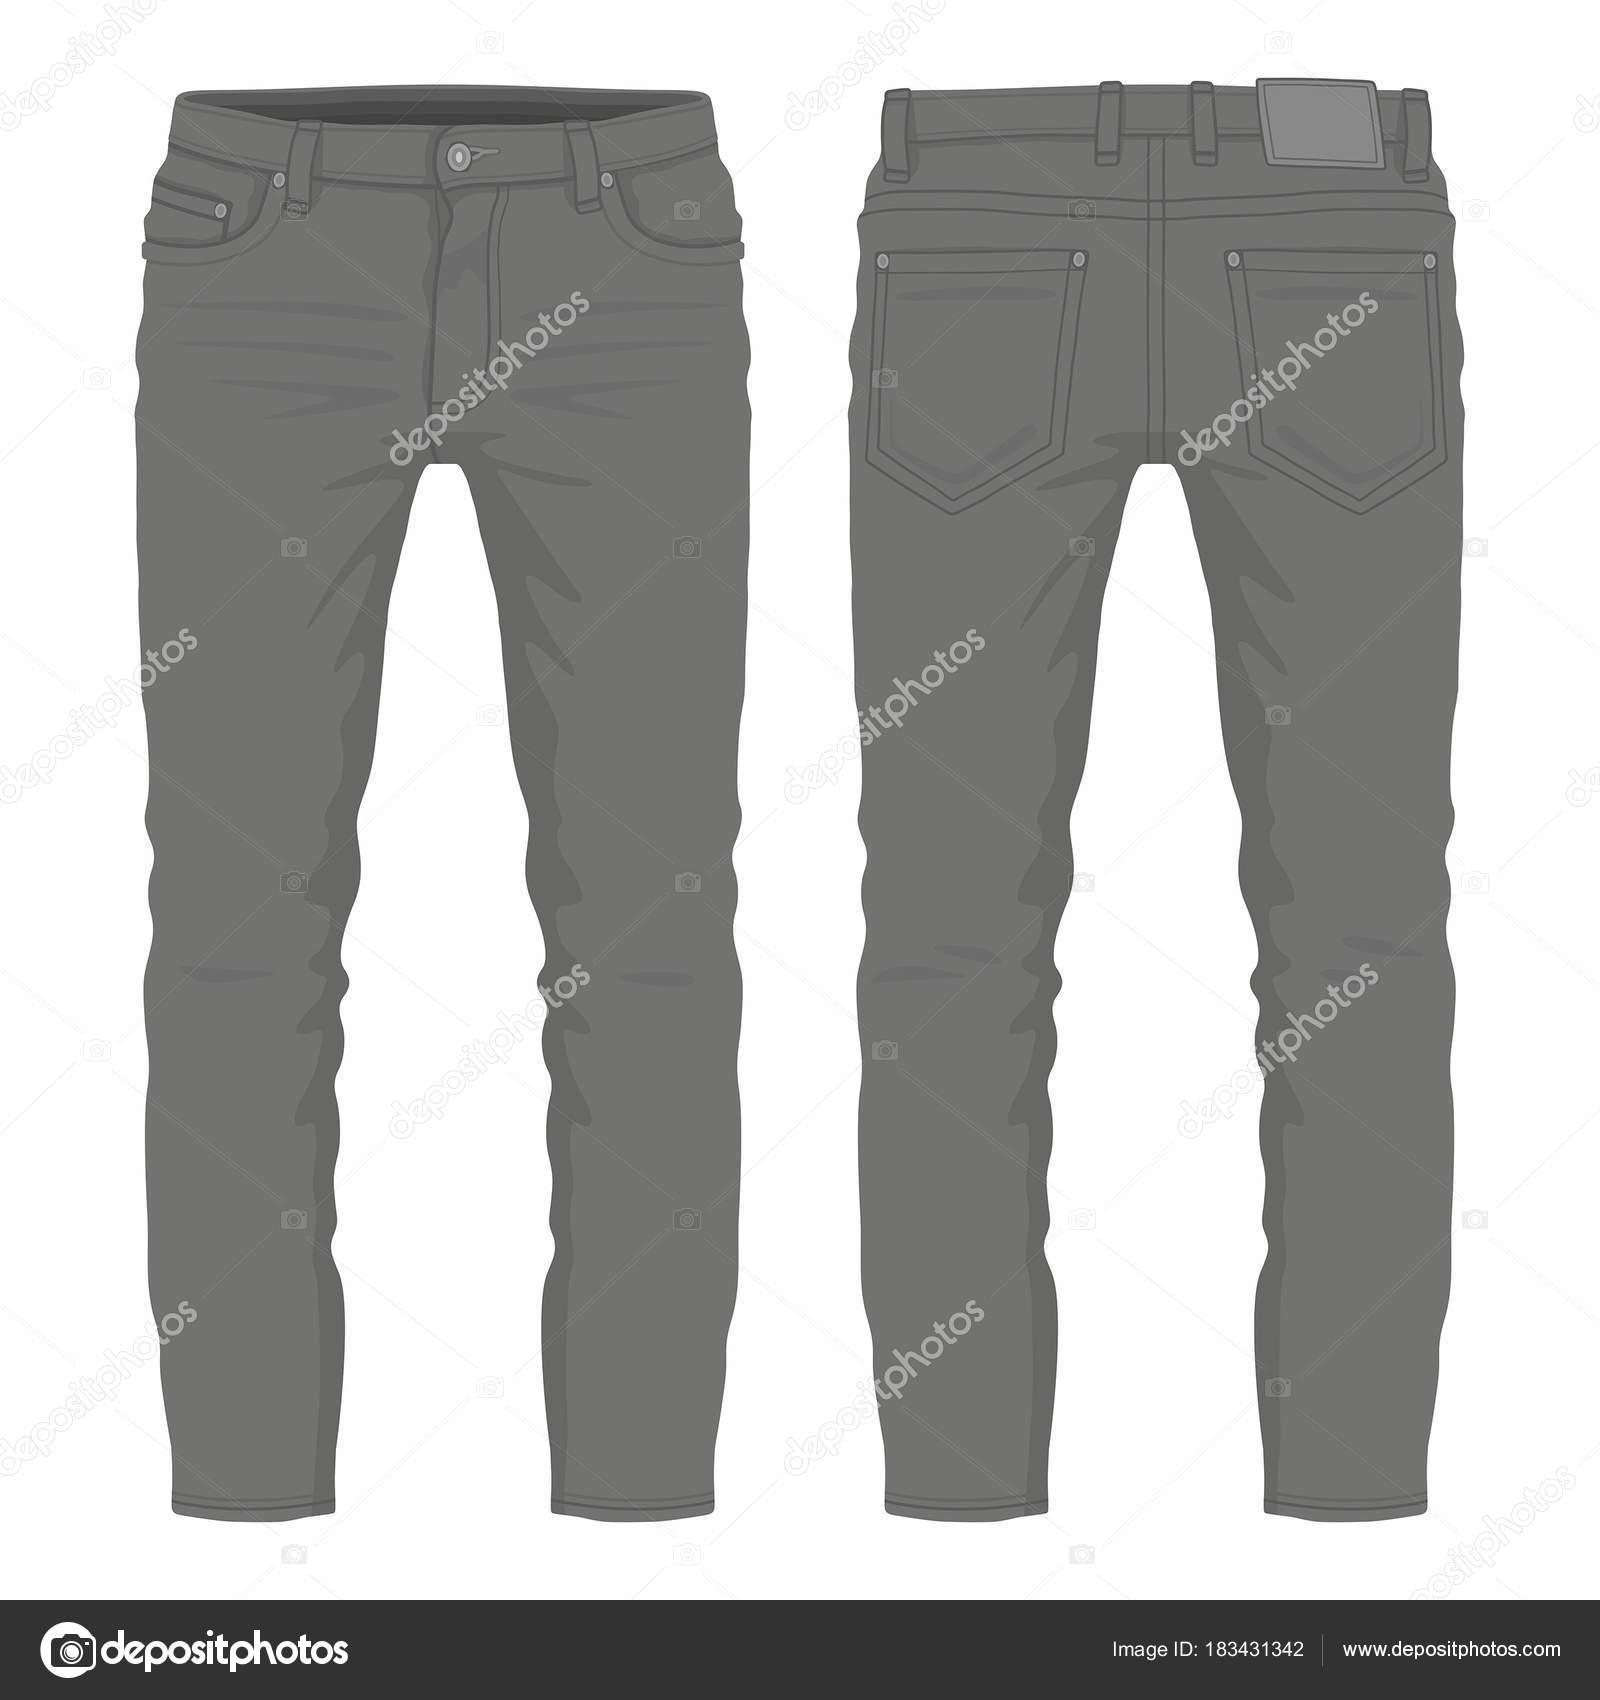 b40c1d3dc Jeans Negro Los Hombres Vista Anverso Reverso Sobre Fondo Blanco — Vector  de stock